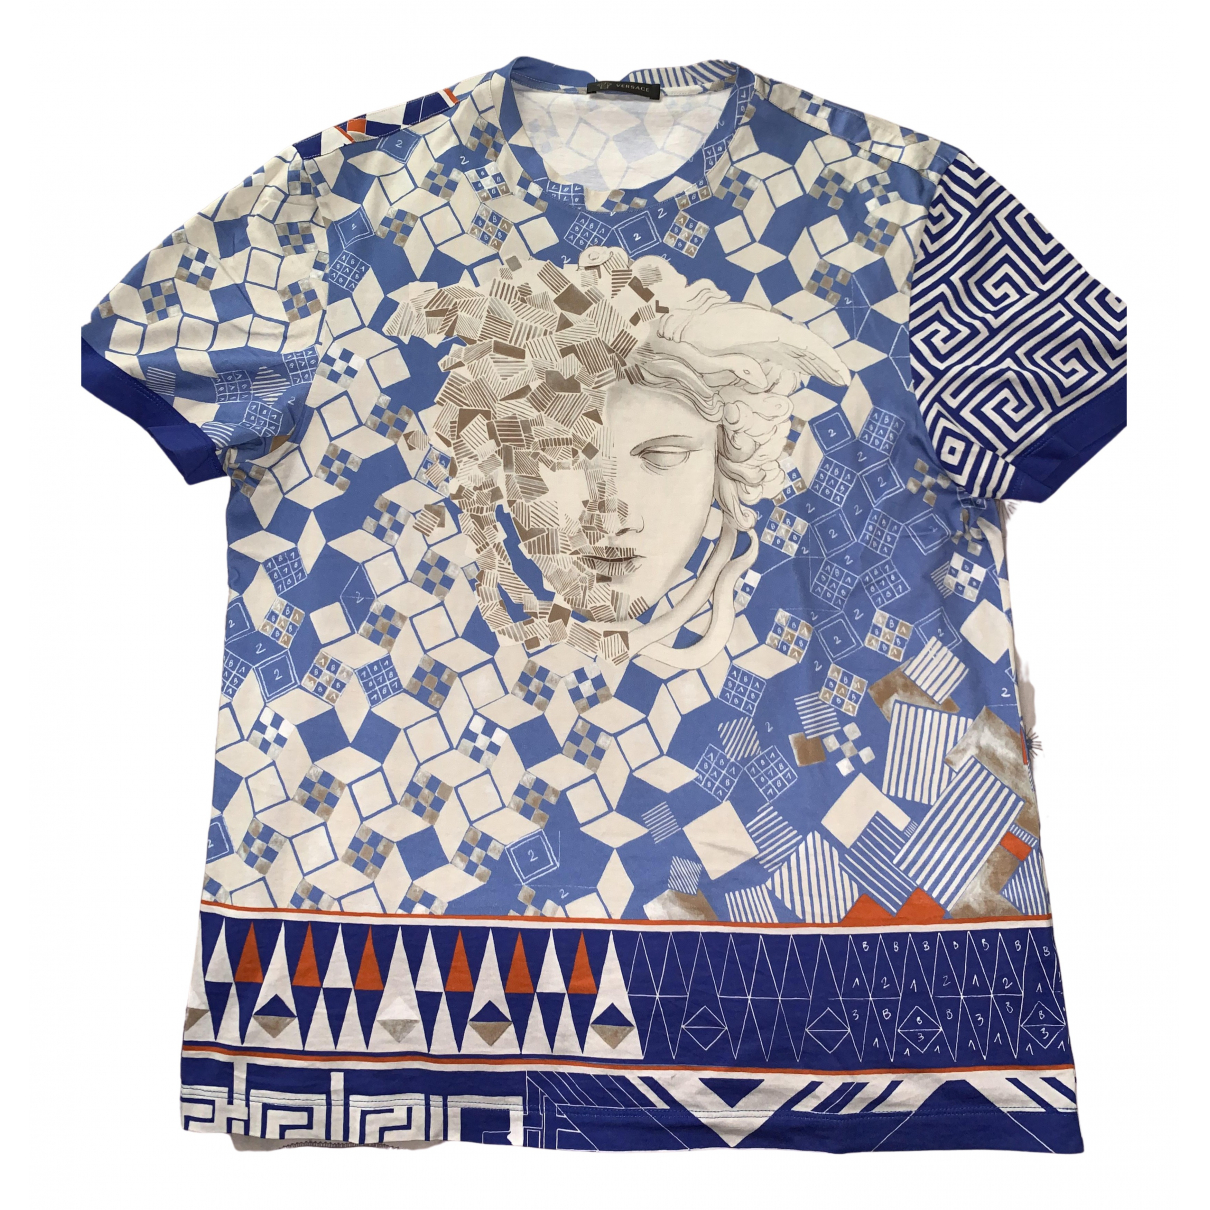 Versace - Tee shirts   pour homme en coton - bleu